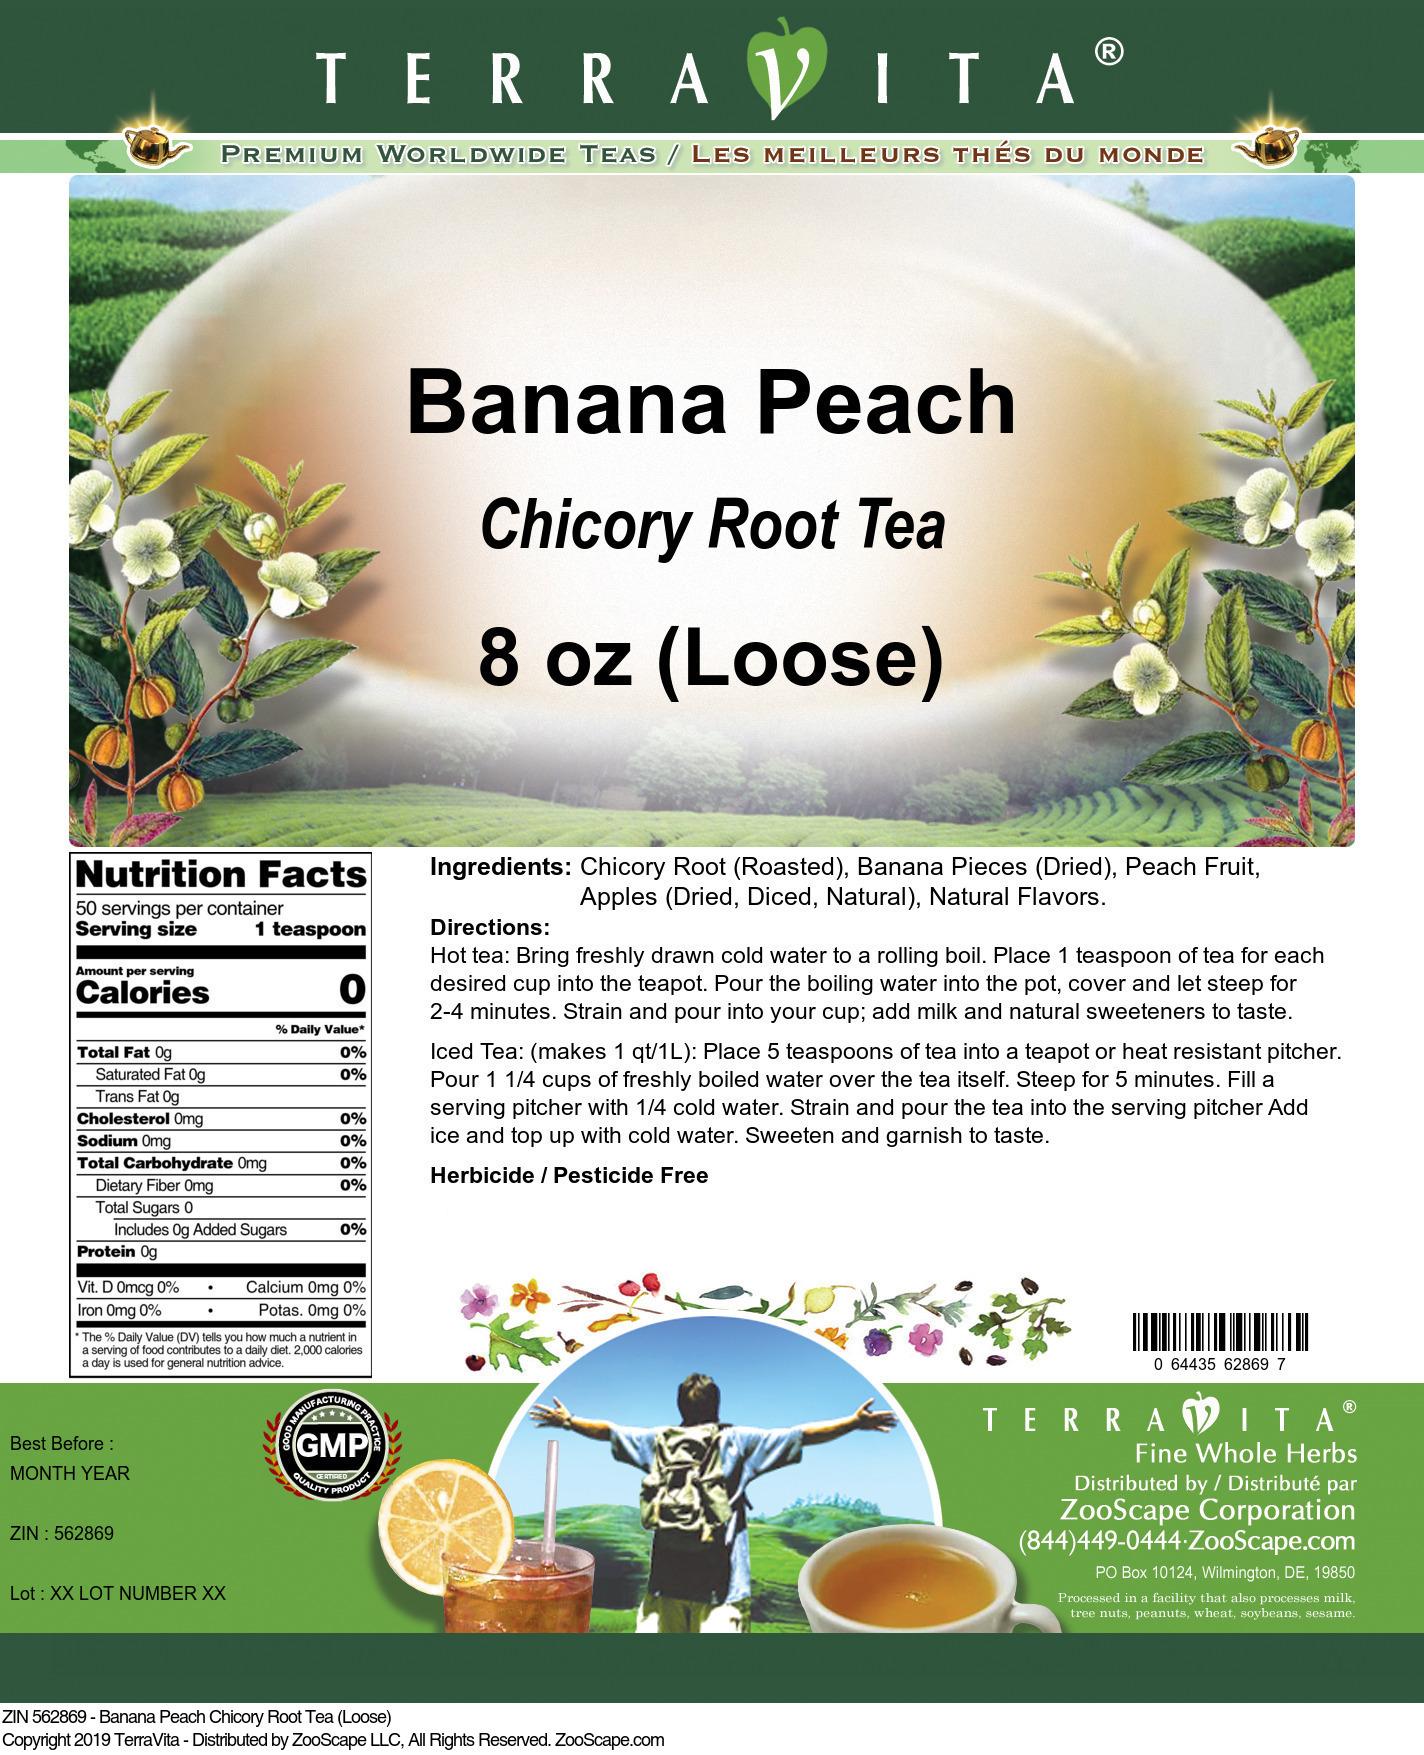 Banana Peach Chicory Root Tea (Loose)